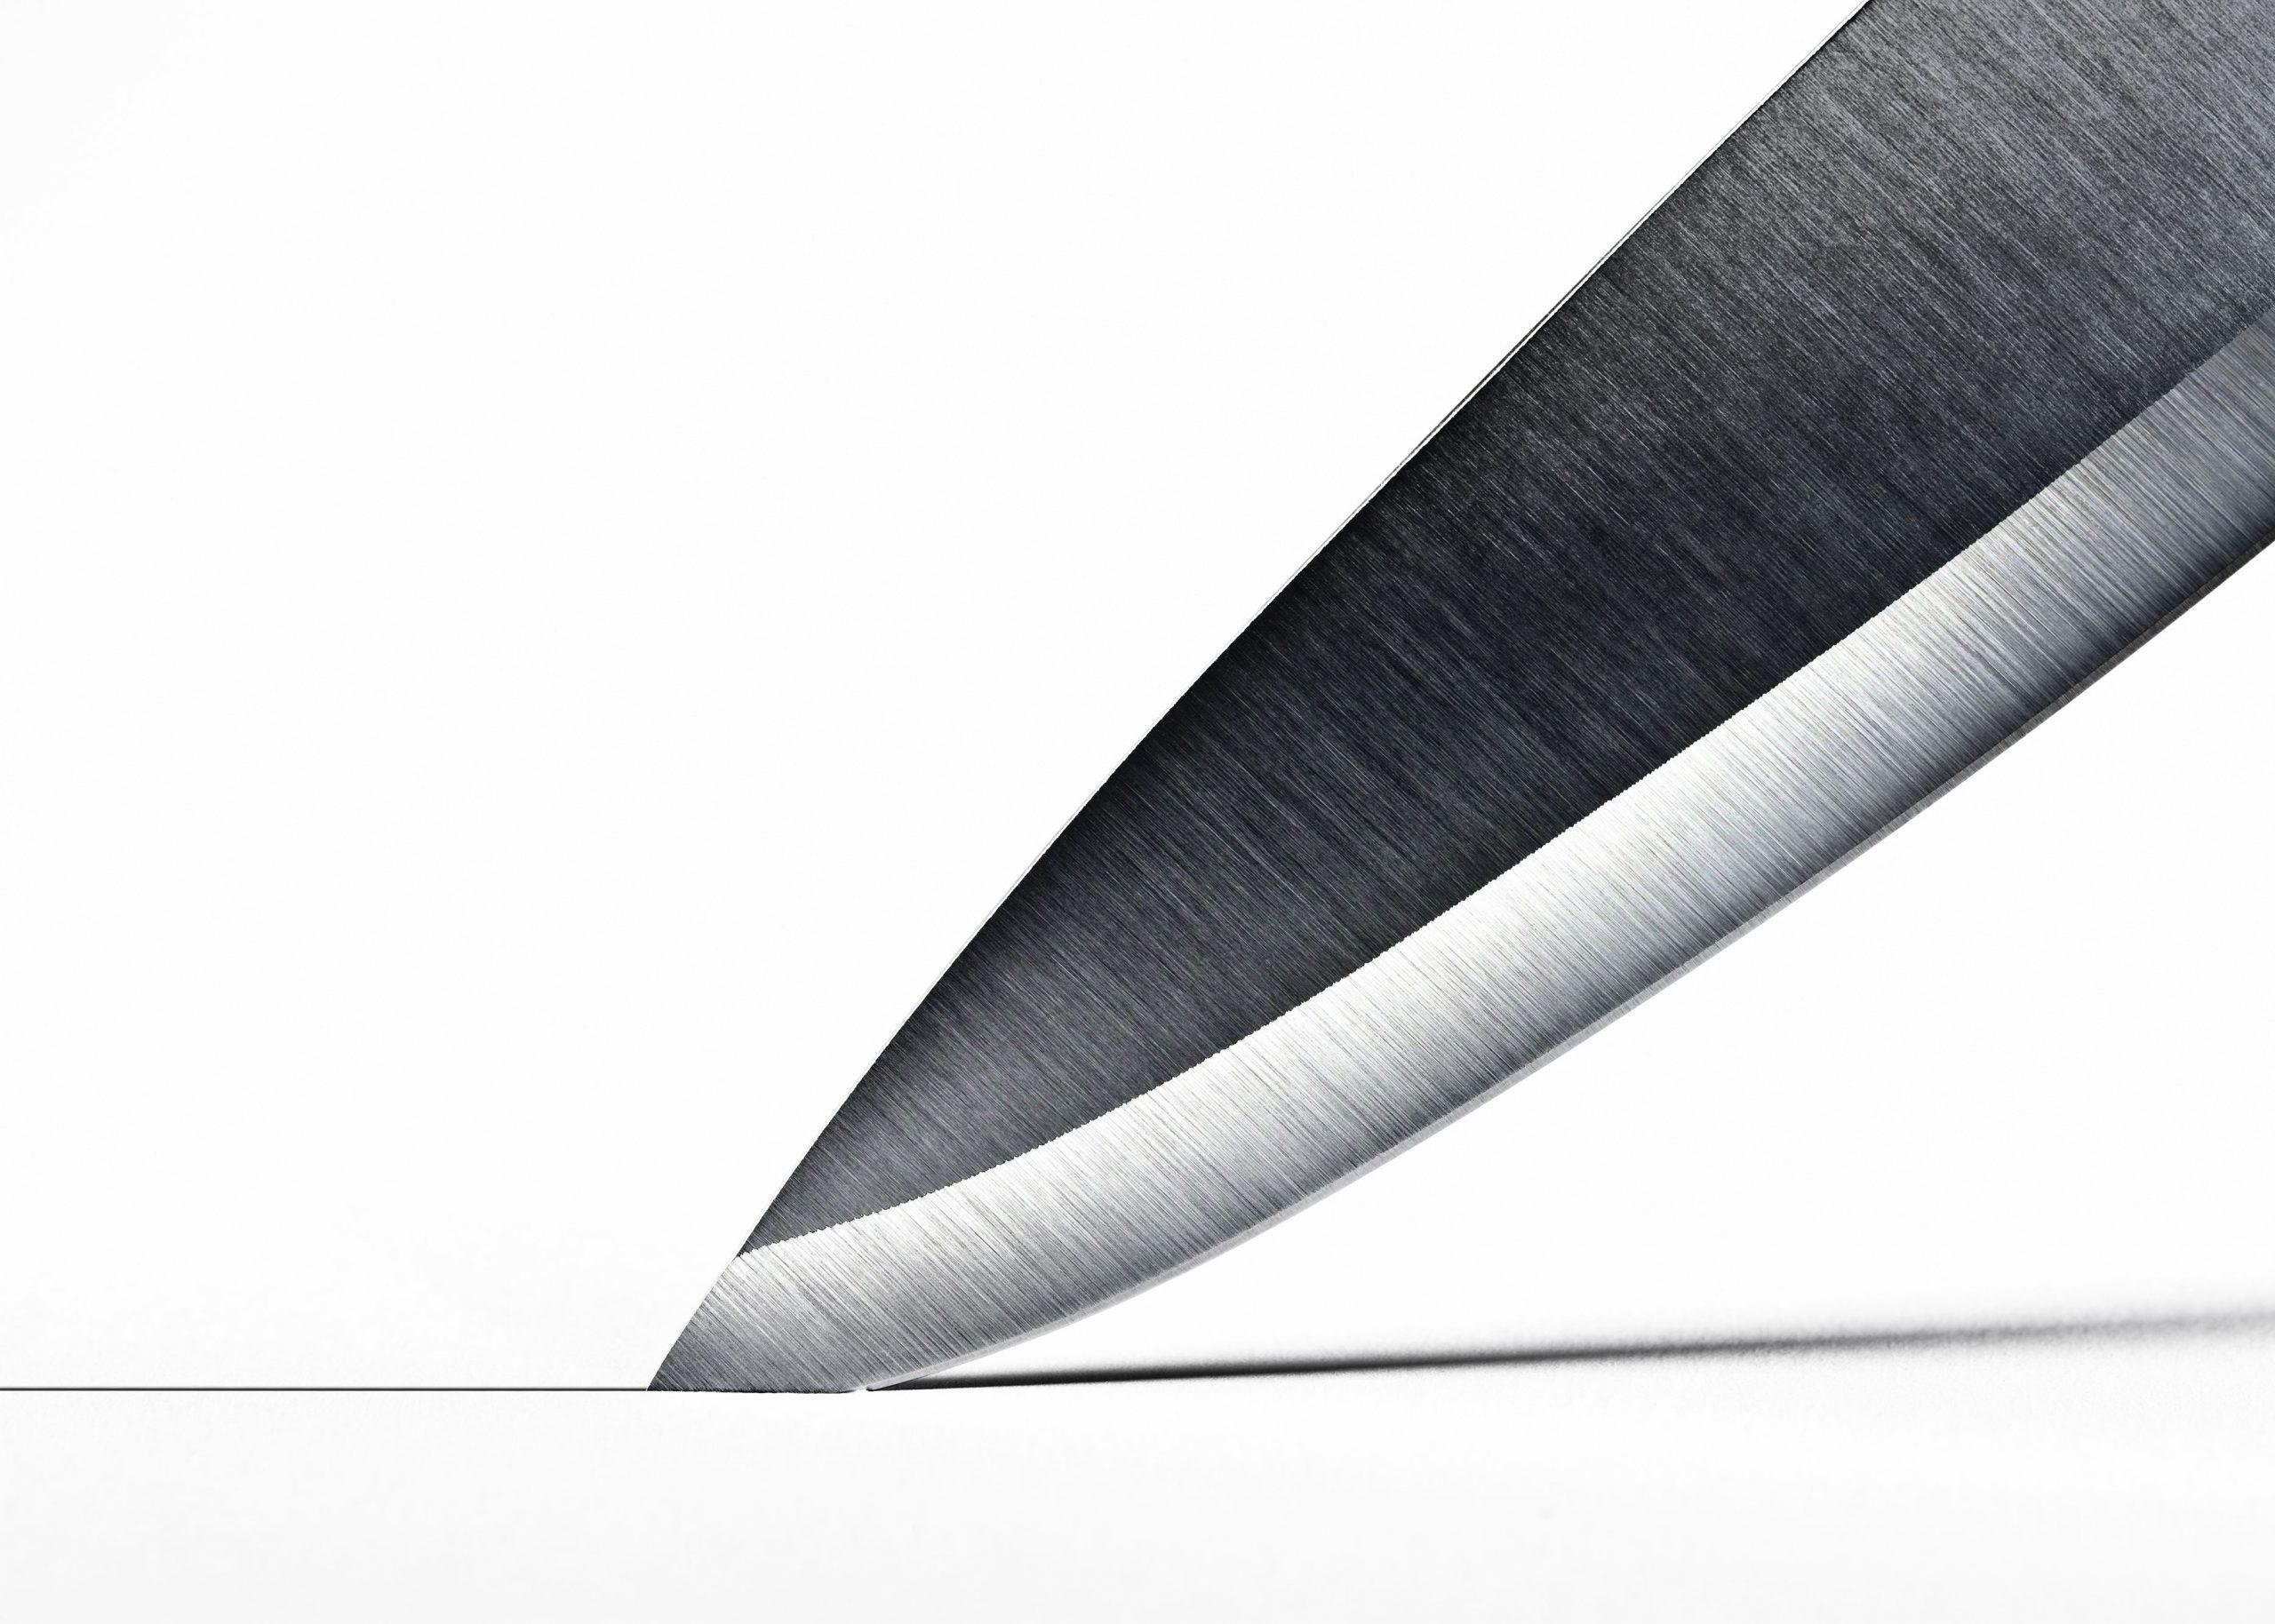 Knife & Blade Coating